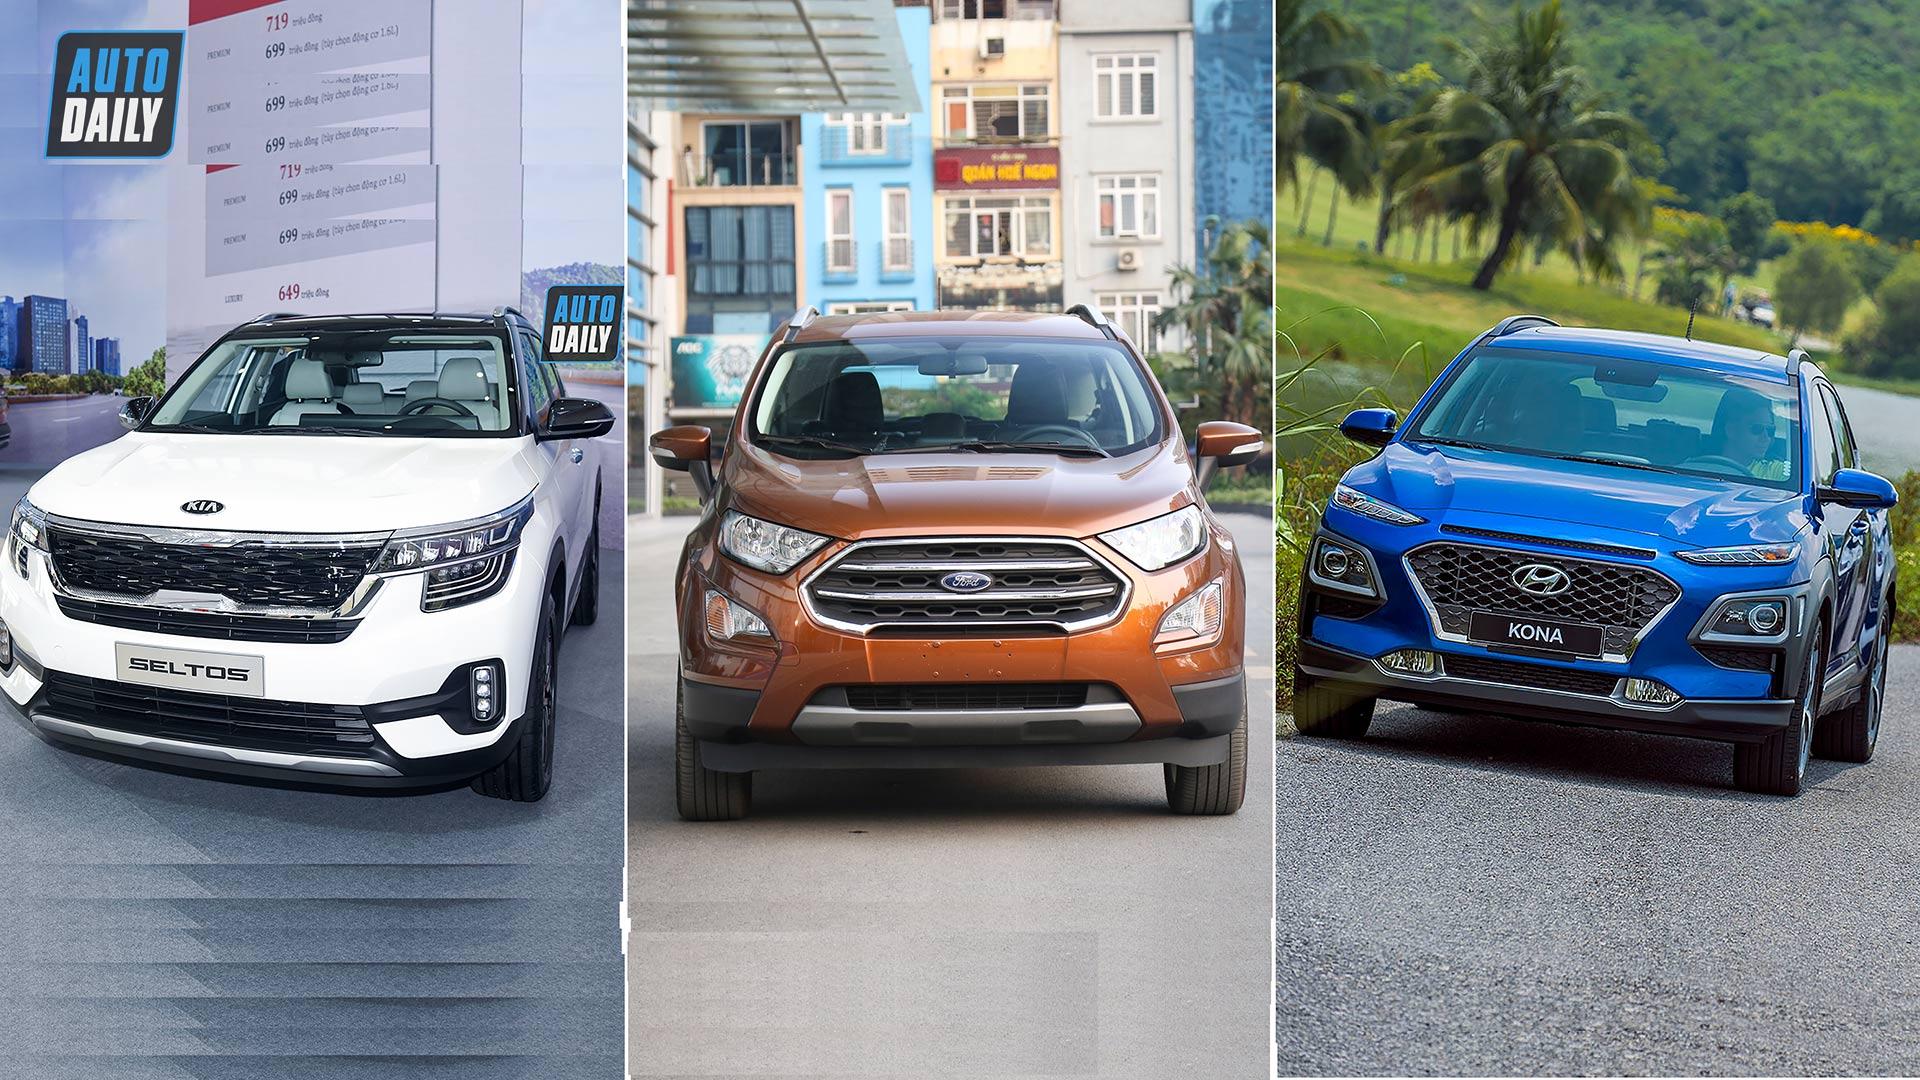 700 triệu, chọn Kia Seltos, Ford EcoSport hay Hyundai Kona?